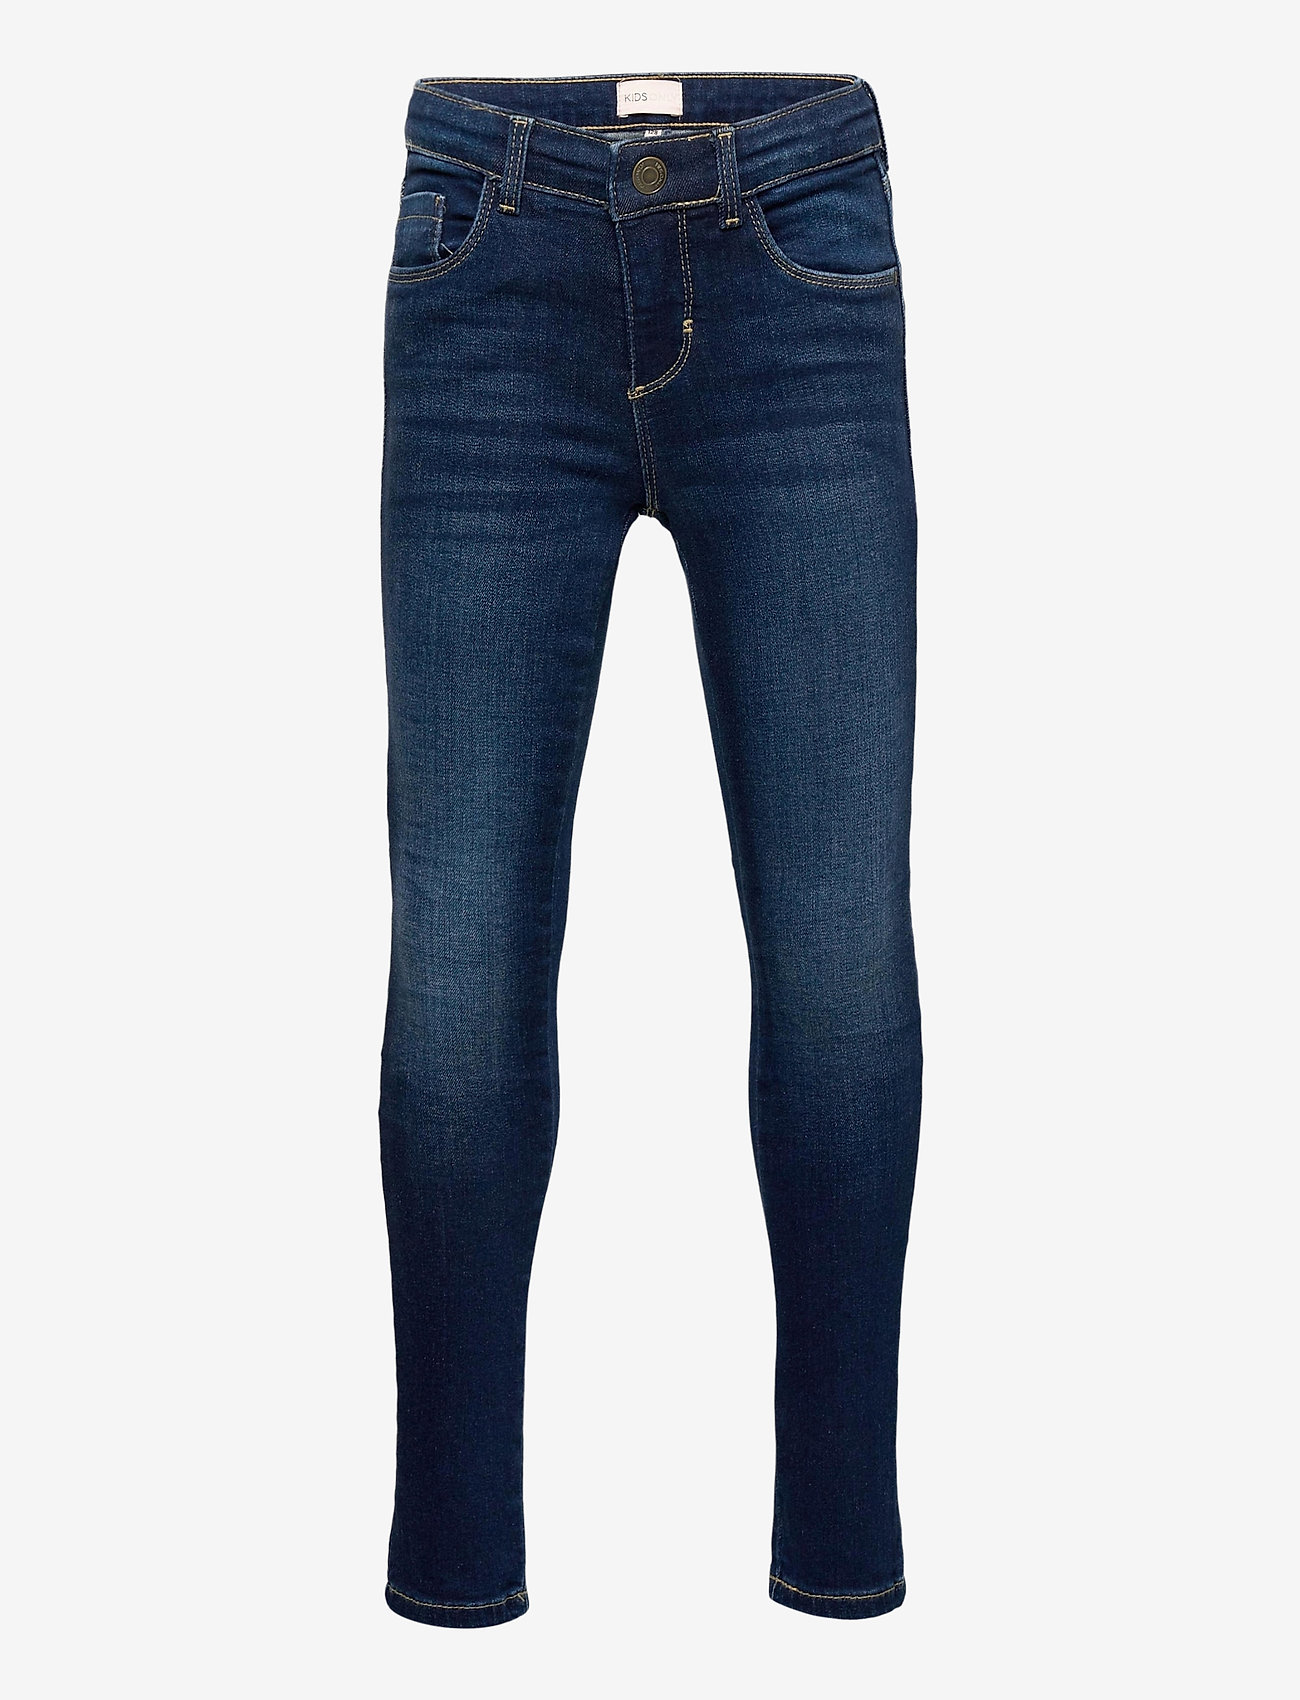 Kids Only - KONRACHEL DARK BLUE DNM JEANS NOOS - jeans - dark blue denim - 0